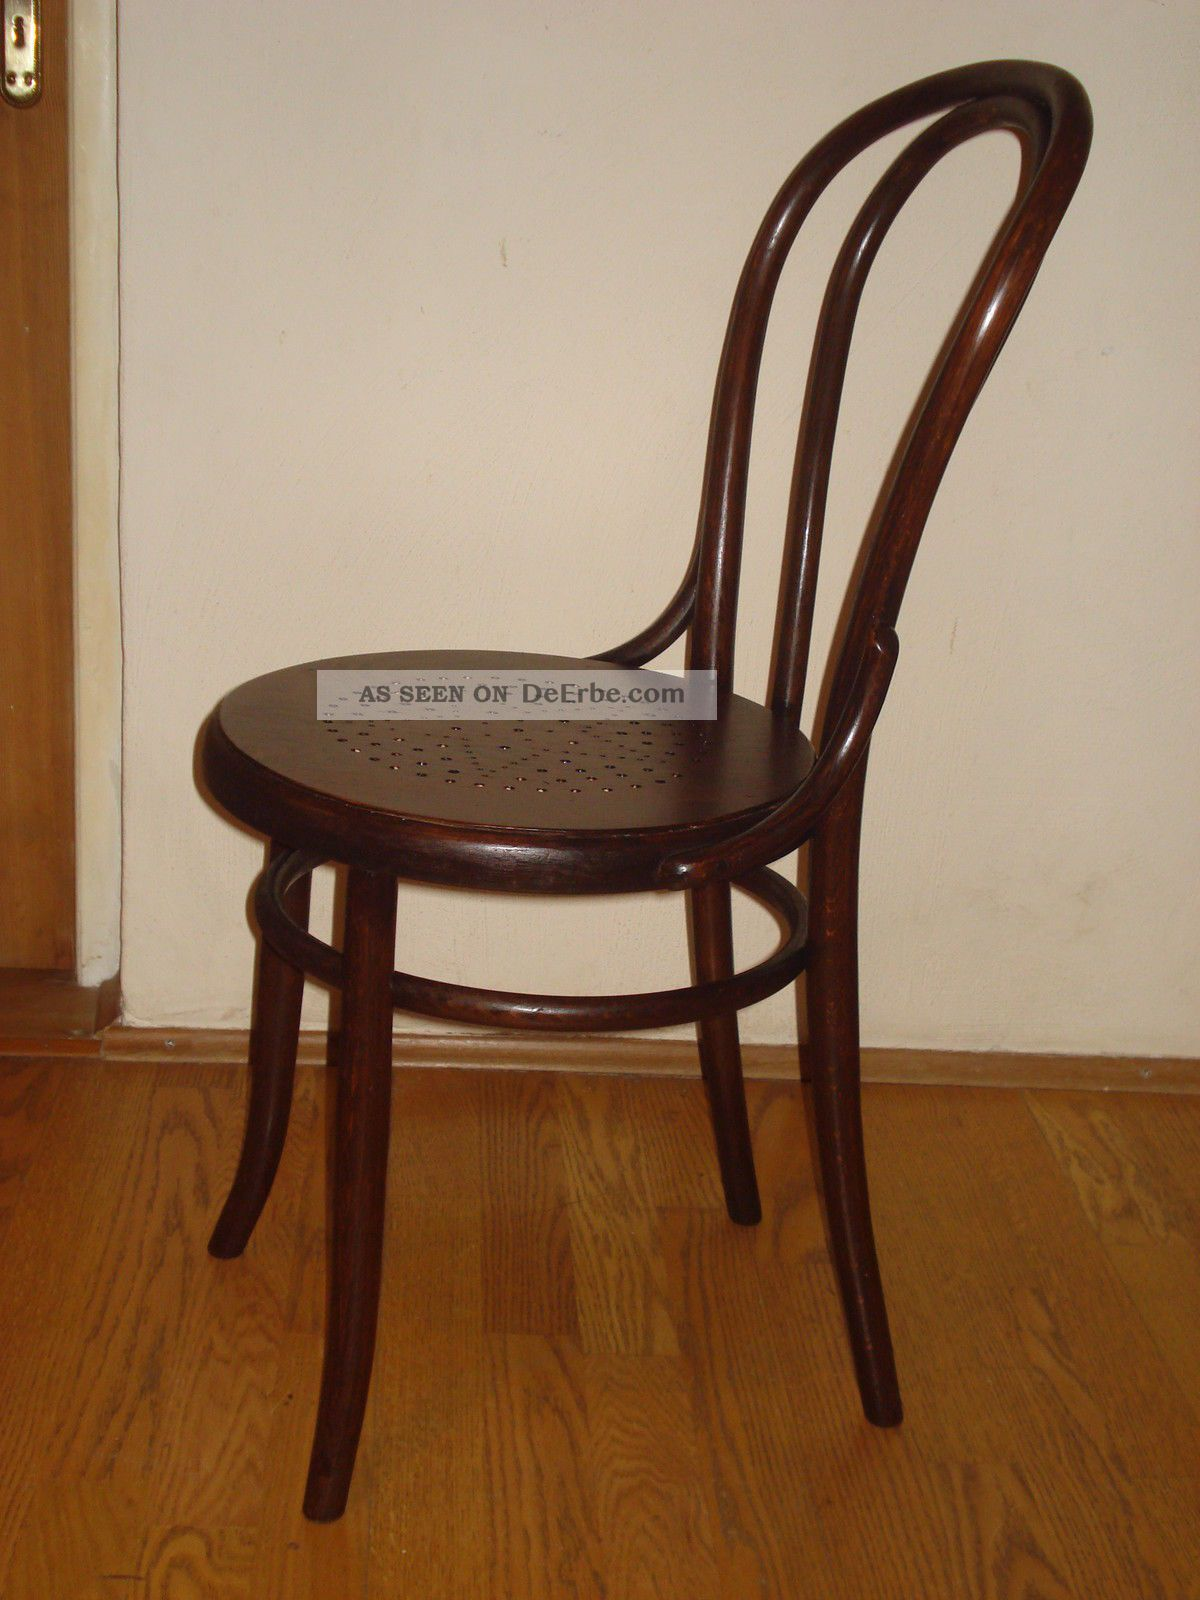 wie thonet 18 fischel 1 wundersch ner bugholz bistro. Black Bedroom Furniture Sets. Home Design Ideas